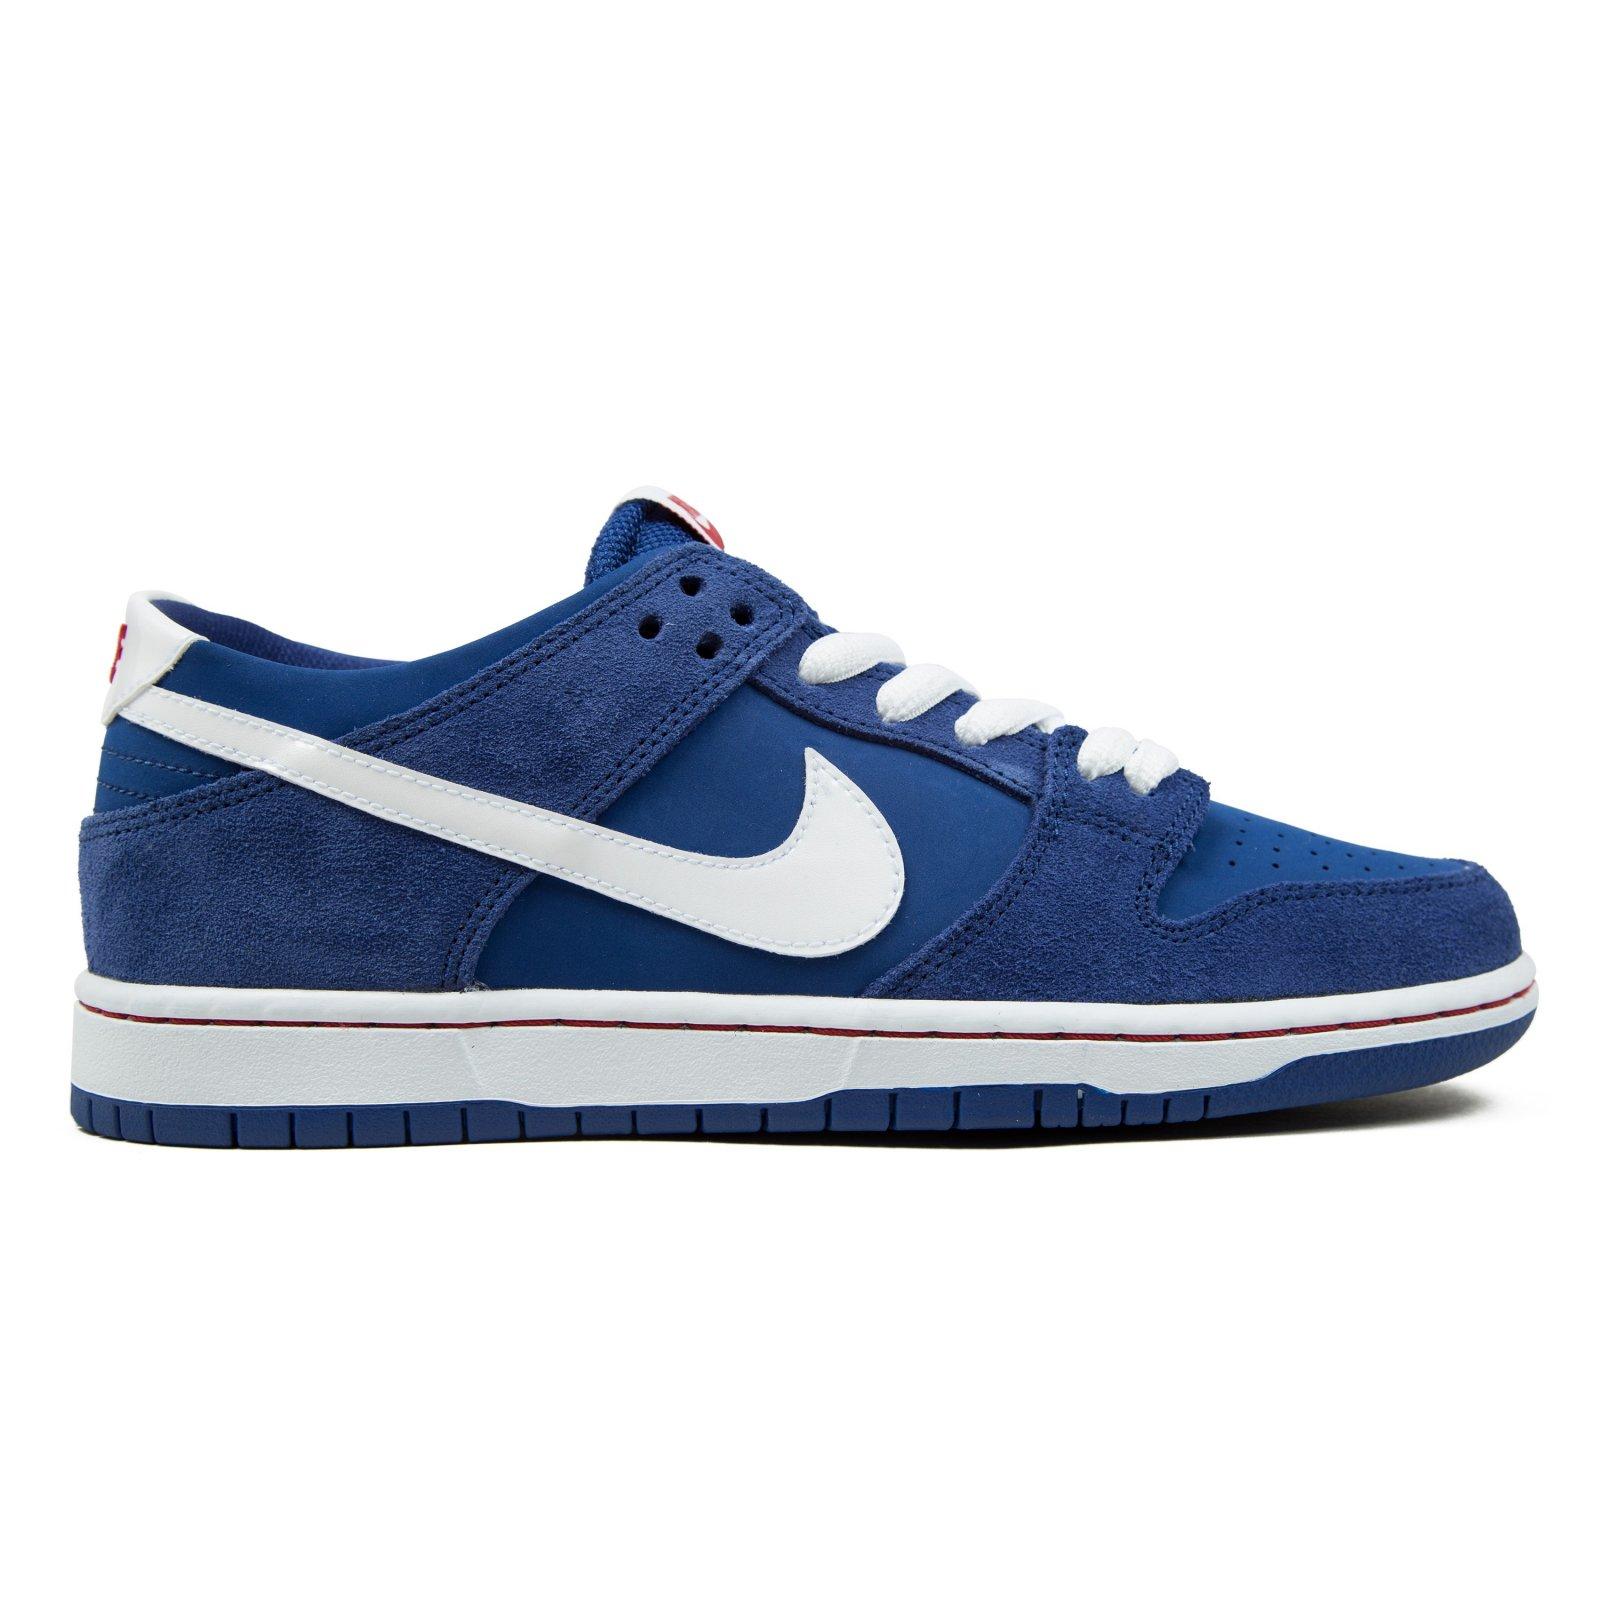 d4471e2483d0 Nike SB Dunk Low Pro Ishod Wair deep royal white gym red